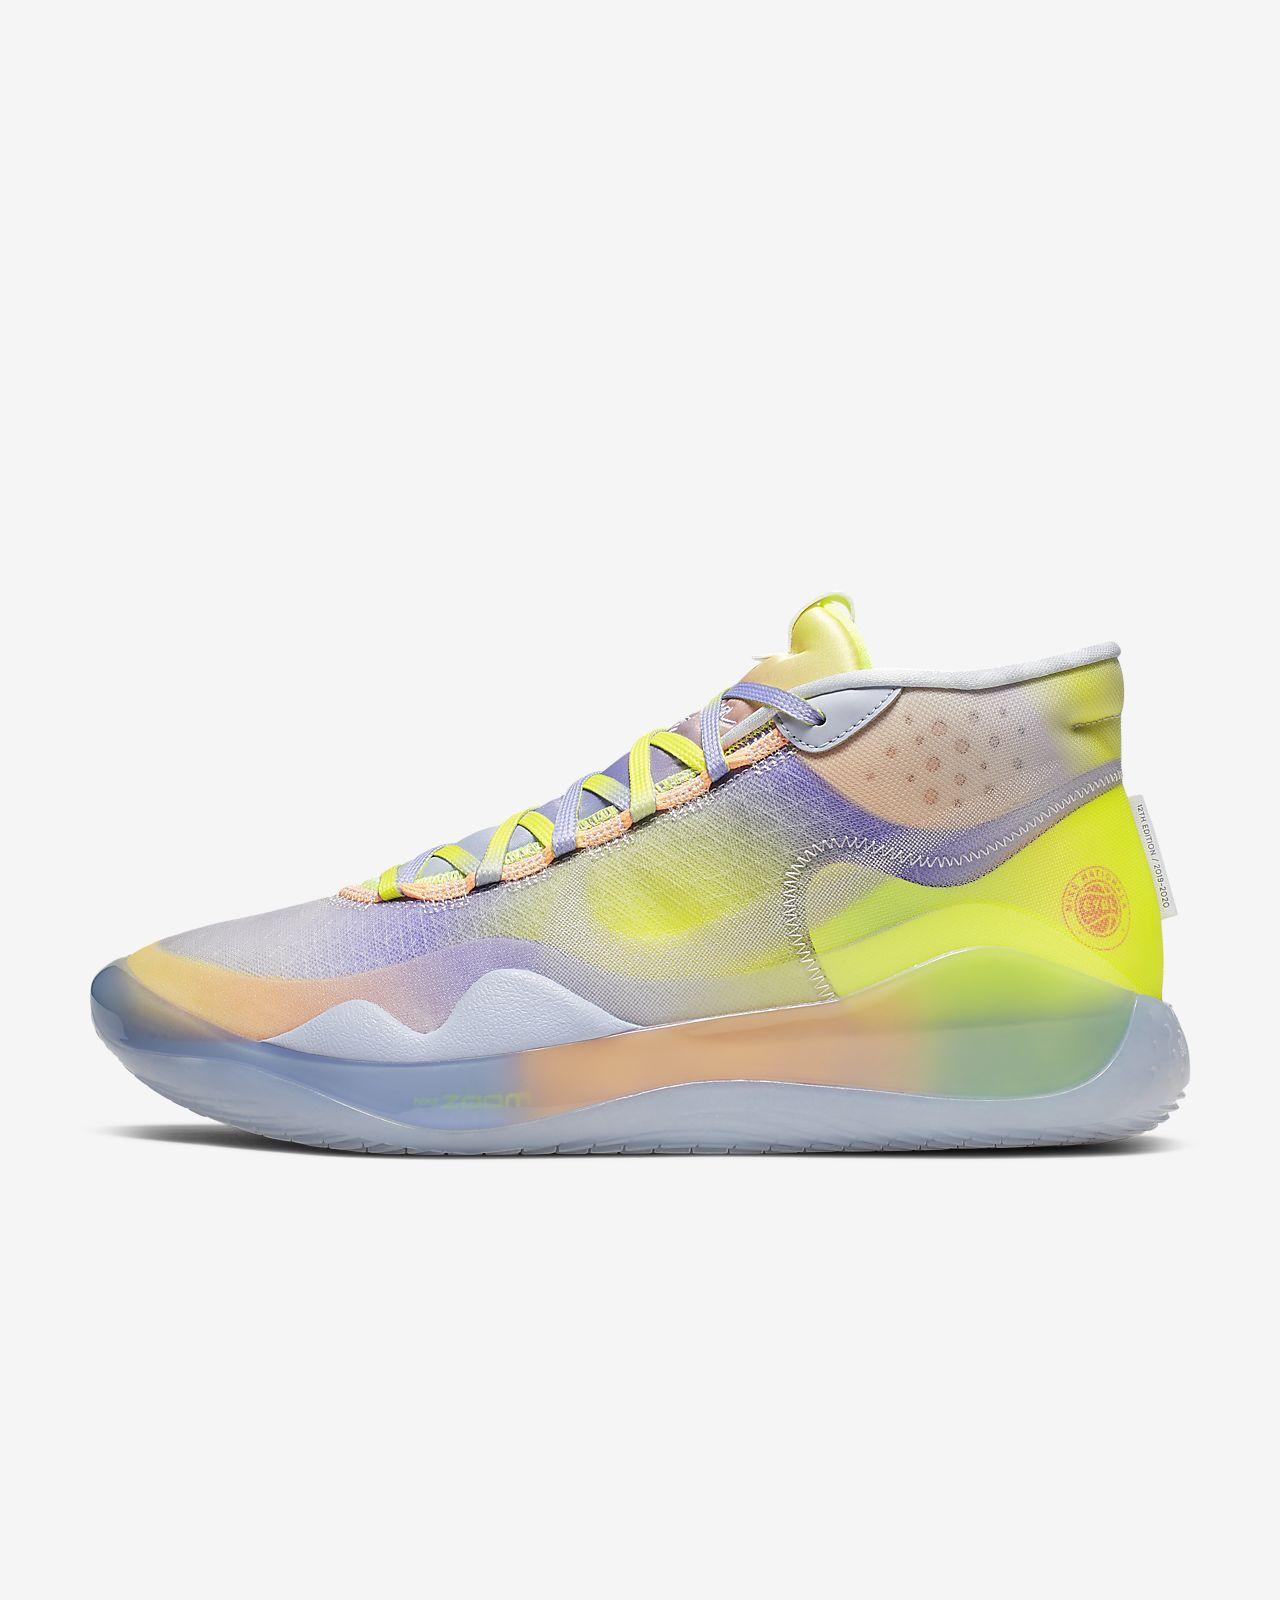 Nike Zoom KD12 Herren-Basketballschuh